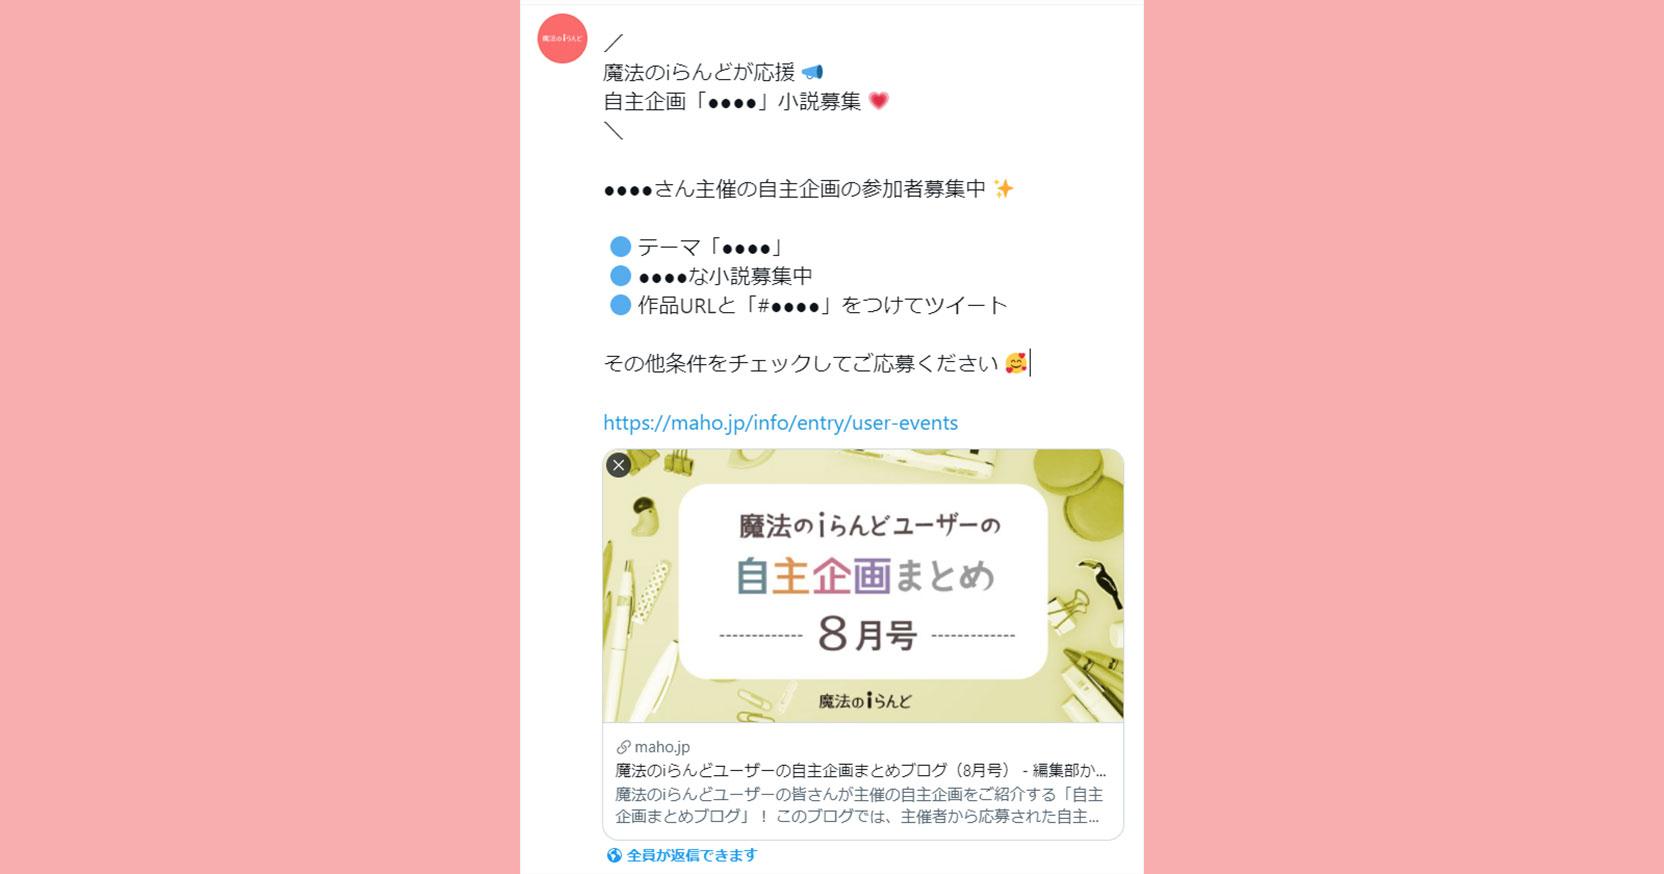 https://storage.googleapis.com/blog-info/entry/2021/09/events_tweet.jpg